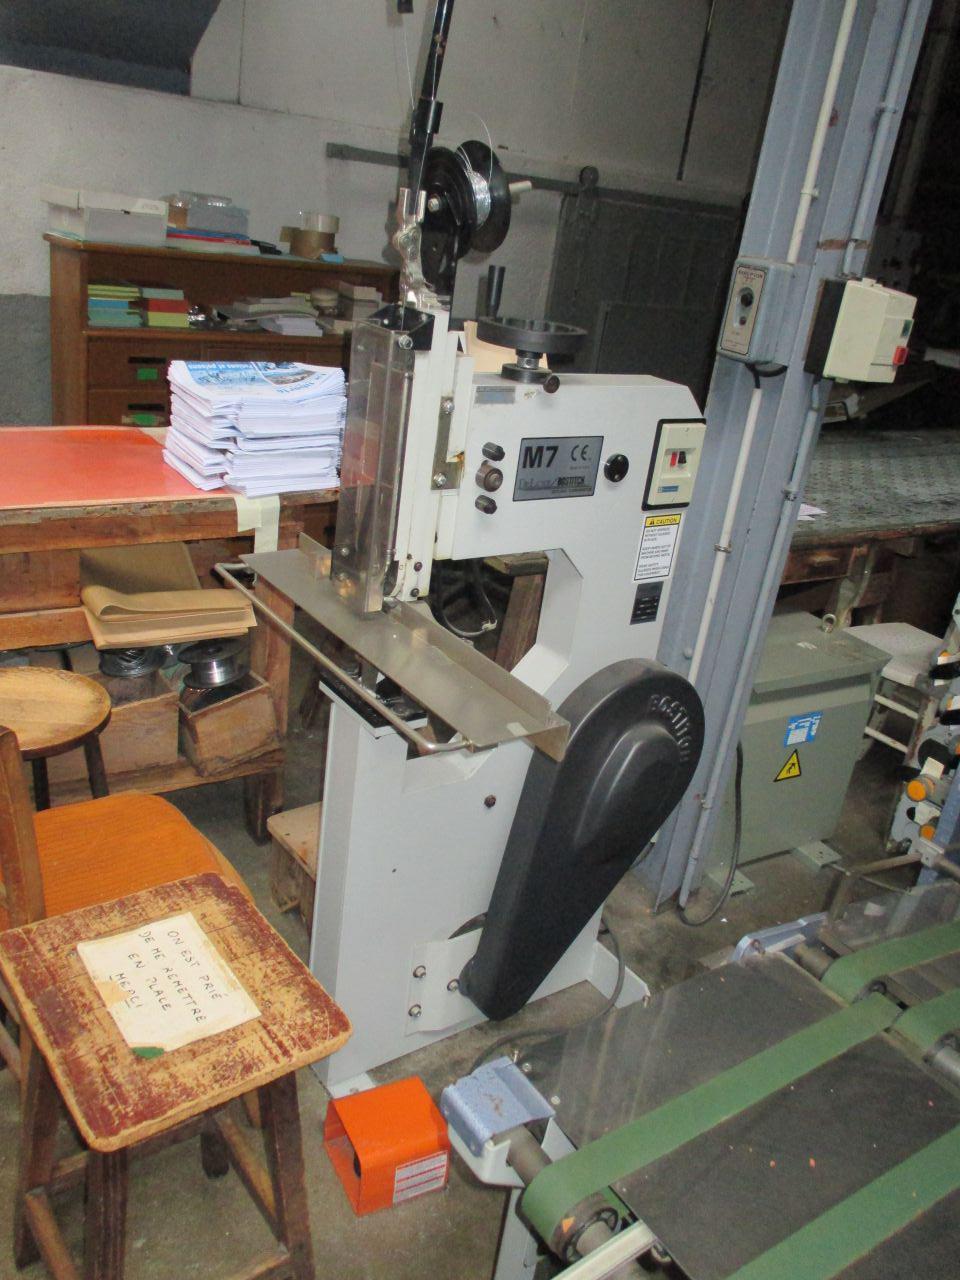 BOSTITCH DELUXE M7, Rocznik : 1996, ref.68849 | www.coci-sa.com/pl | 68849n_6.jpg